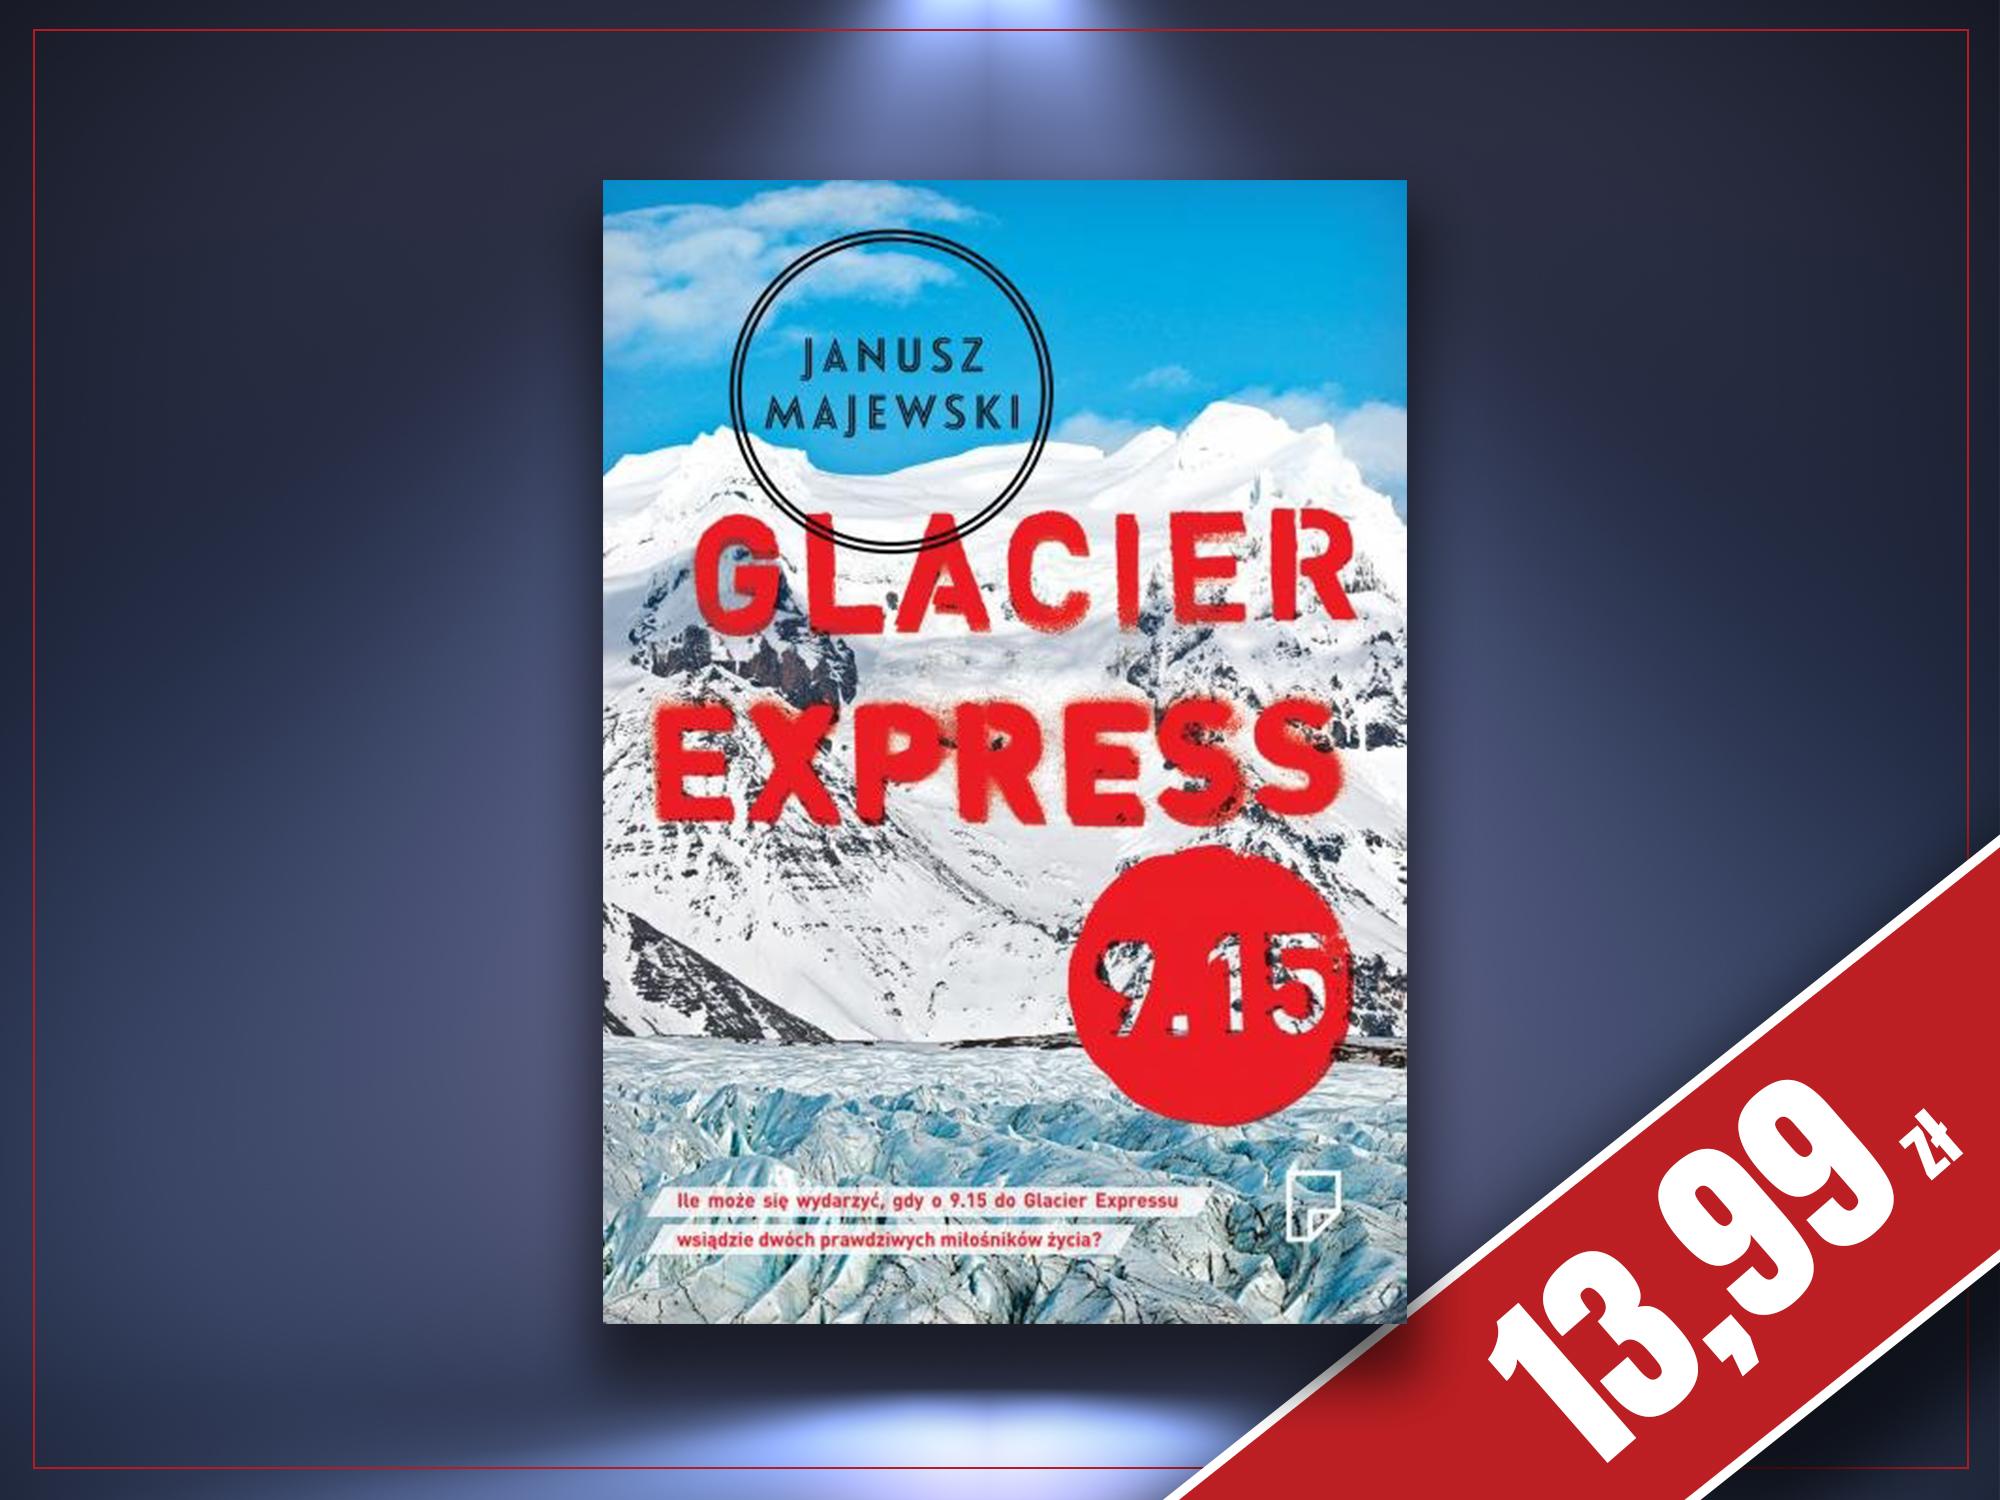 Glacier Express 9.15, Janusz Majewski